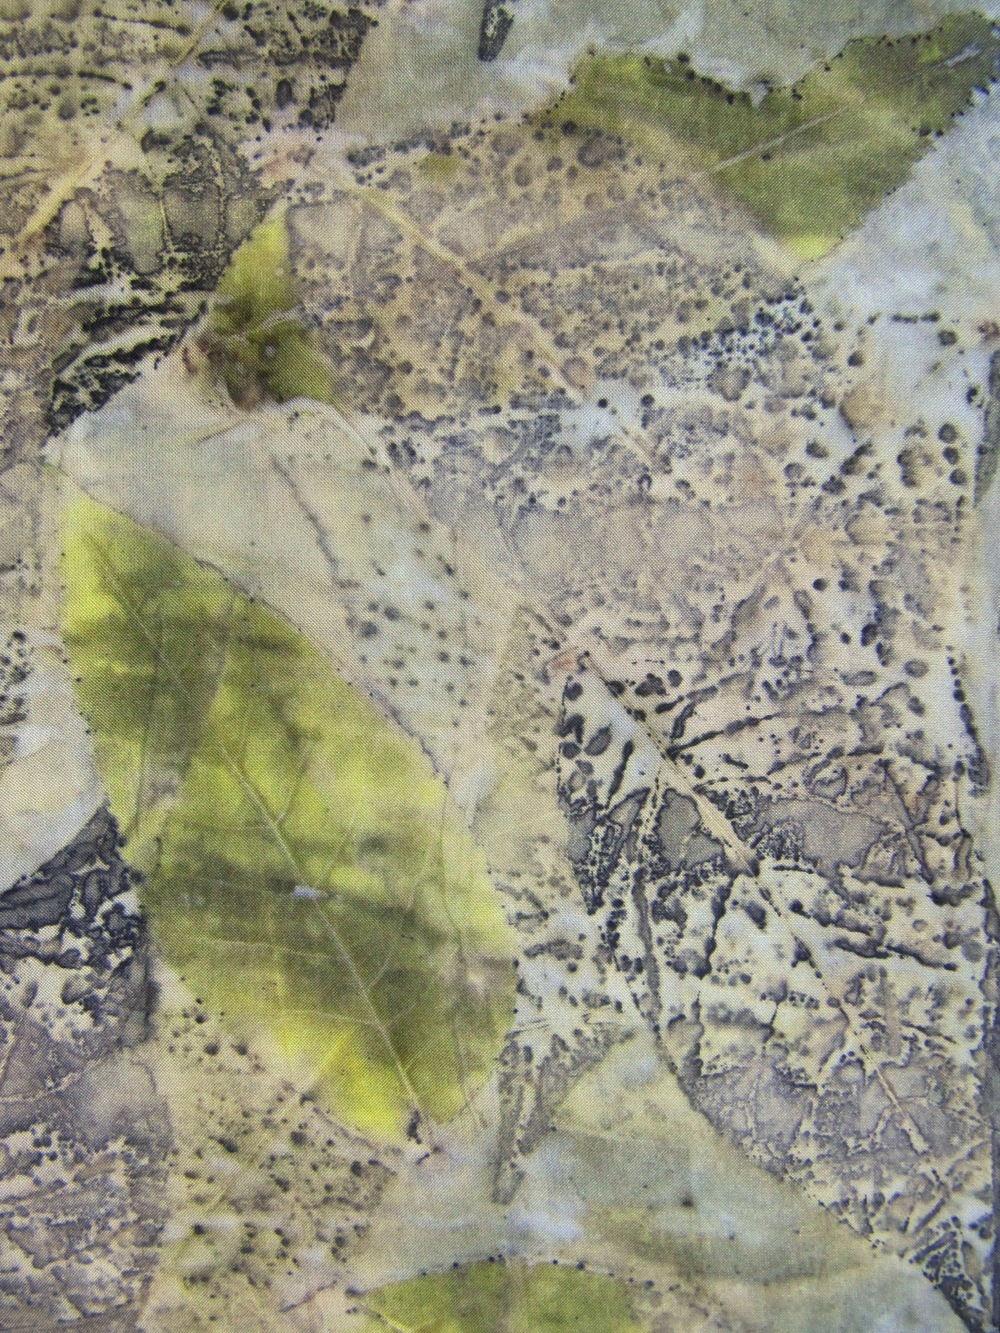 Black Walnut Leaves 9-26.JPG